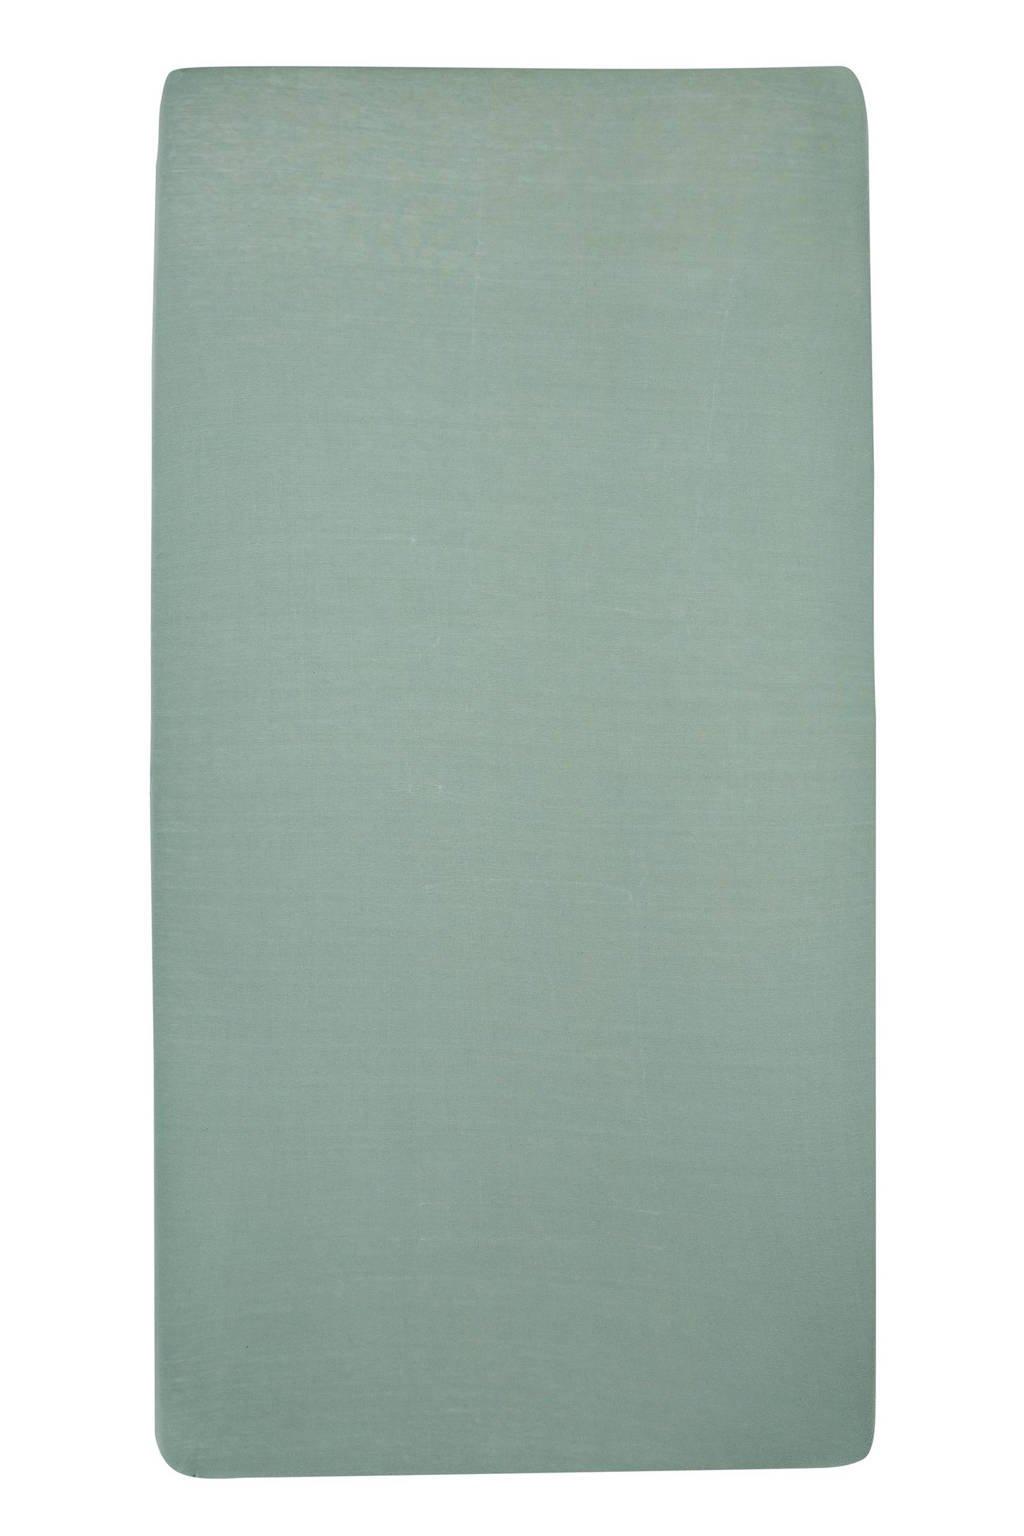 Meyco jersey hoeslaken ledikant 60x120 cm Stone green, Stone Green